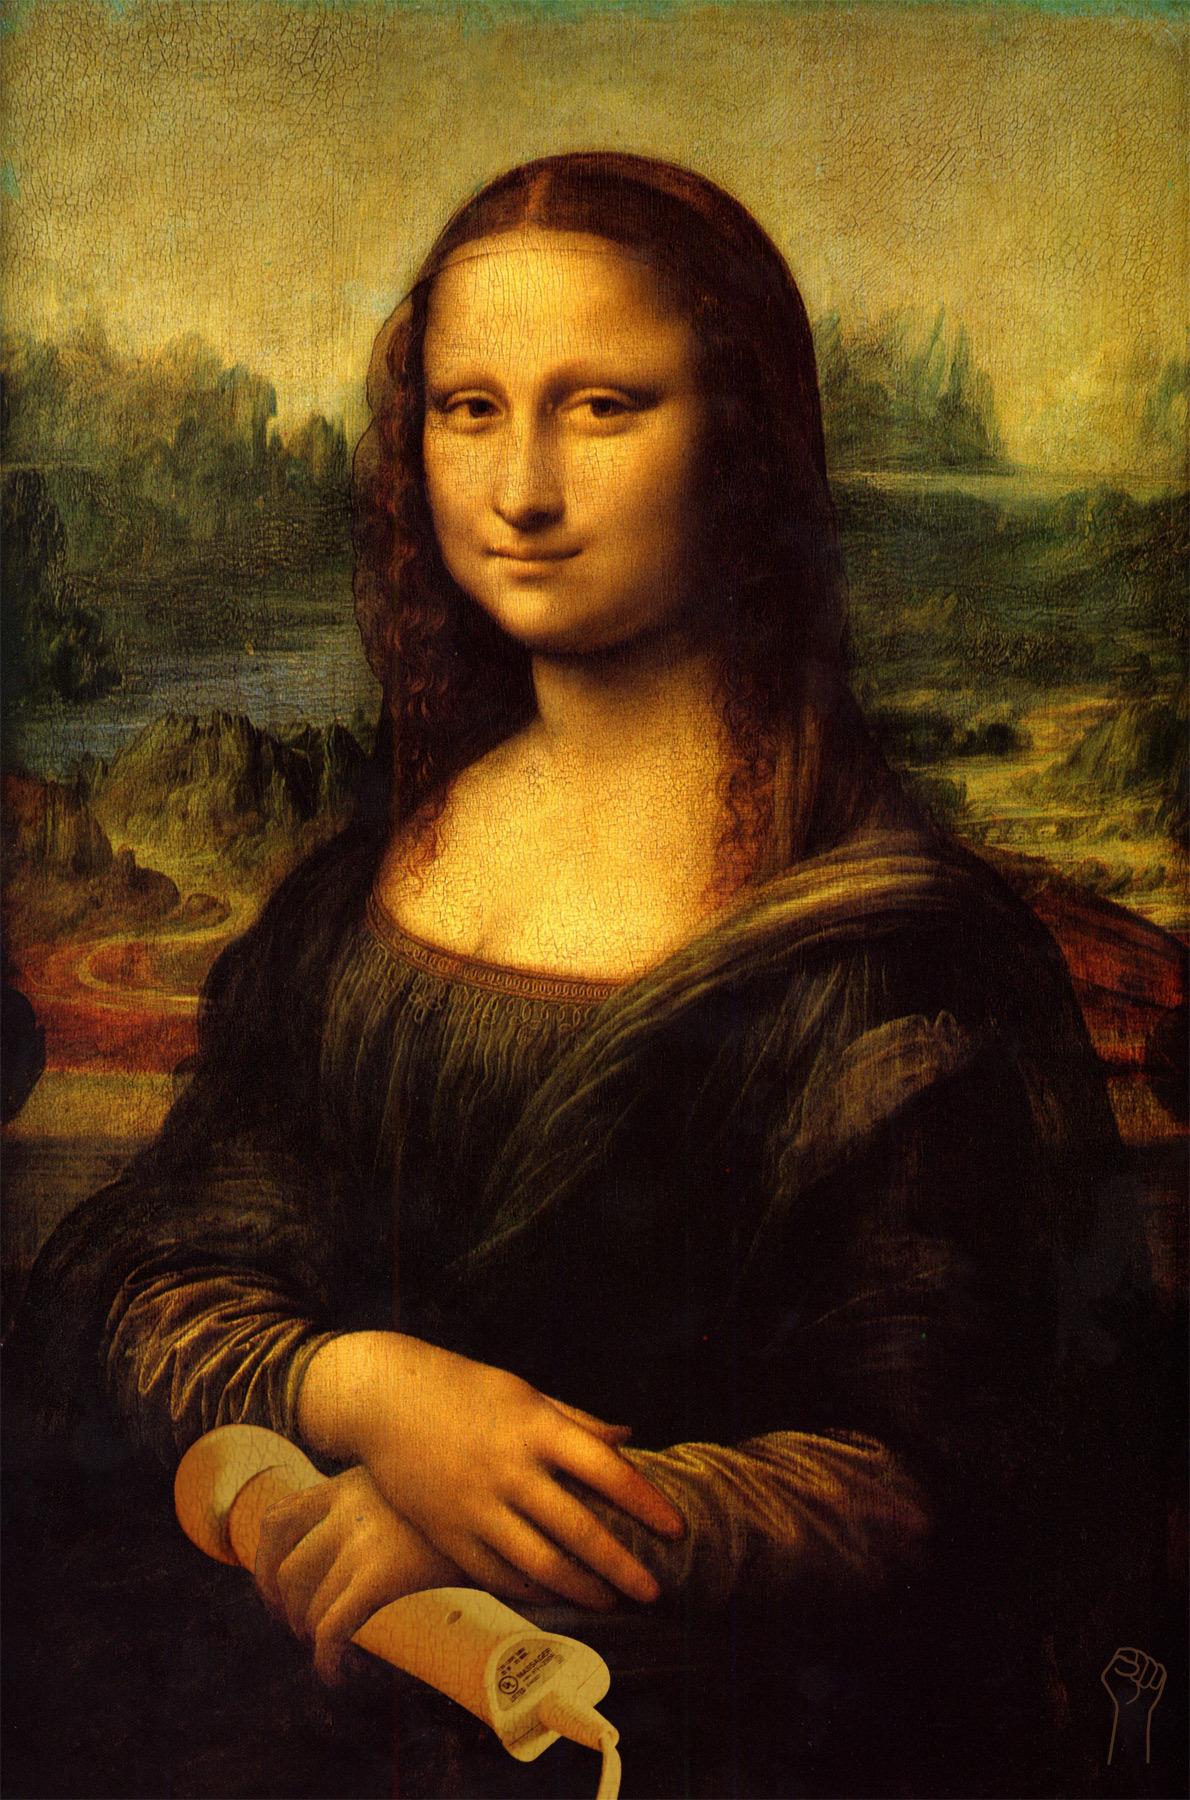 Mona Lisa with Hitachi by Leonardo Da Vinci.